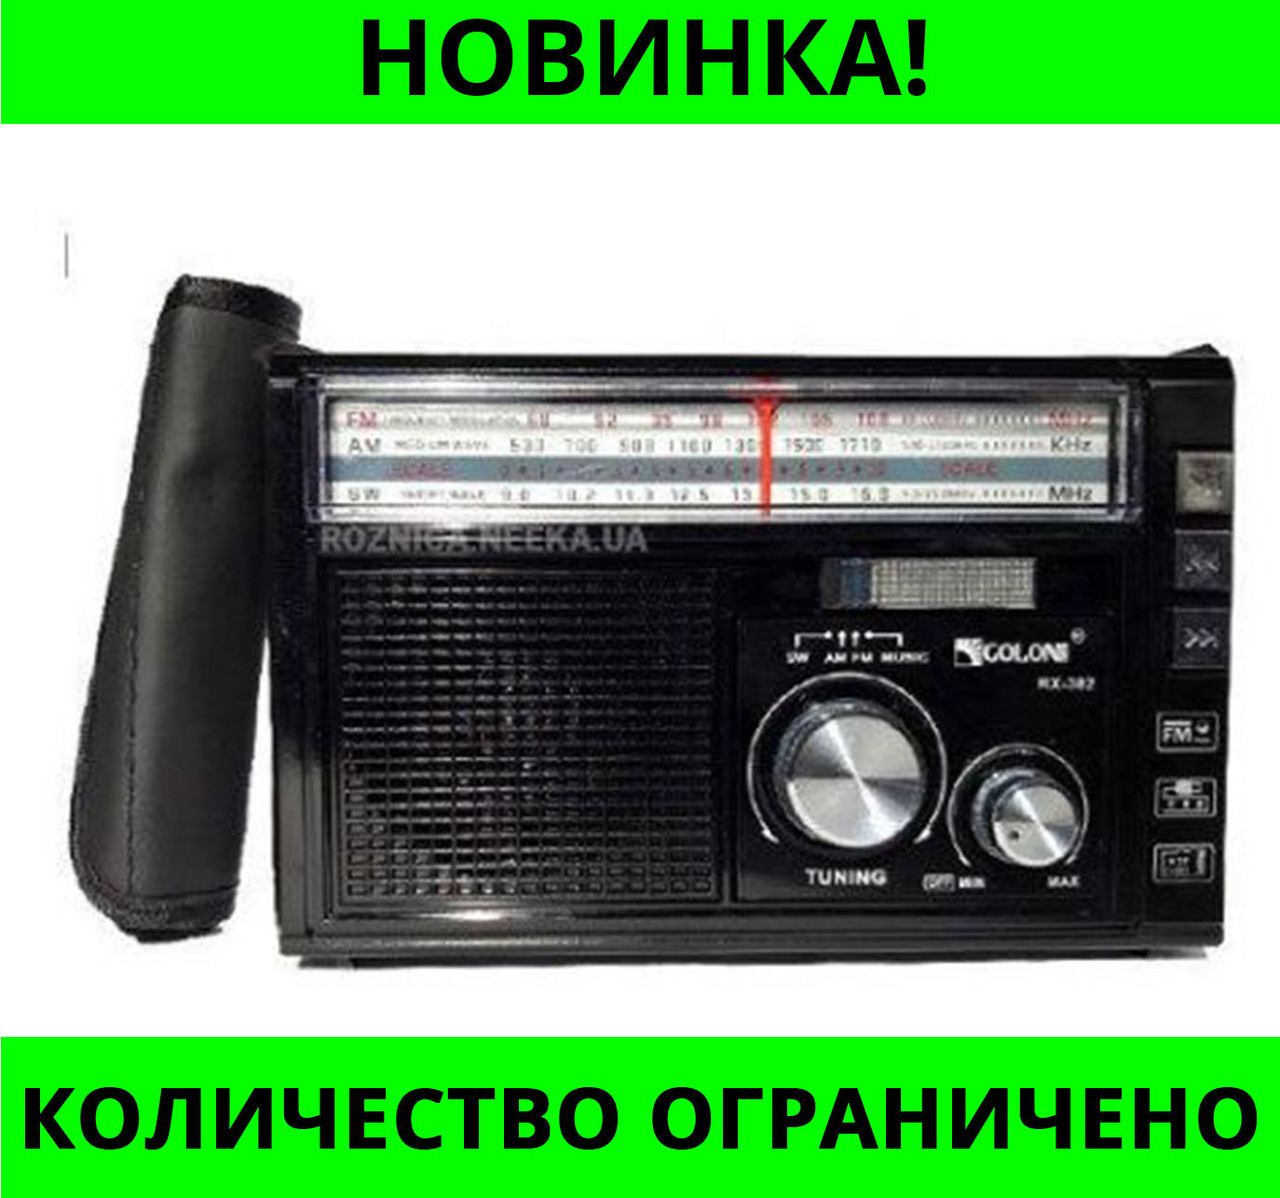 Радиоприемник GOLON RX-382 с MP3, USB + фонарик!Розница и Опт